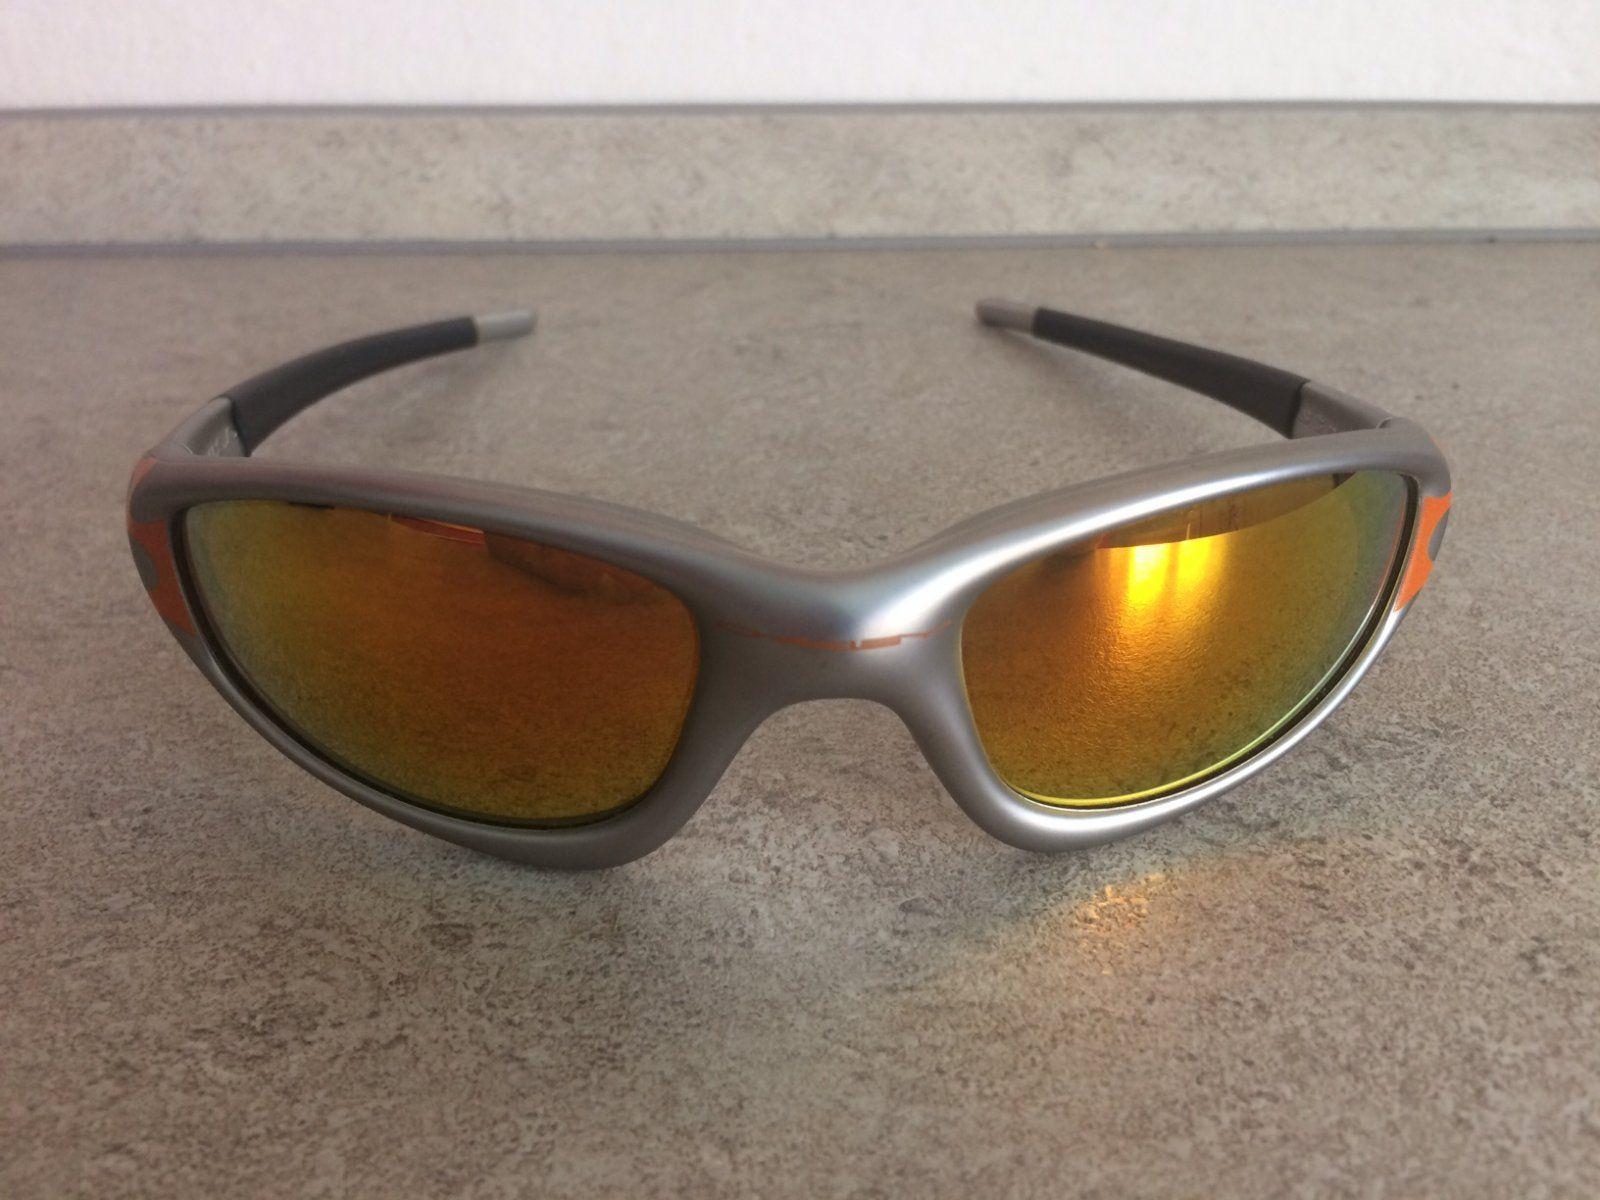 e8bb79e535c Oakley Straight Jacket Flame Fire Iridium - IMG 5401.JPG